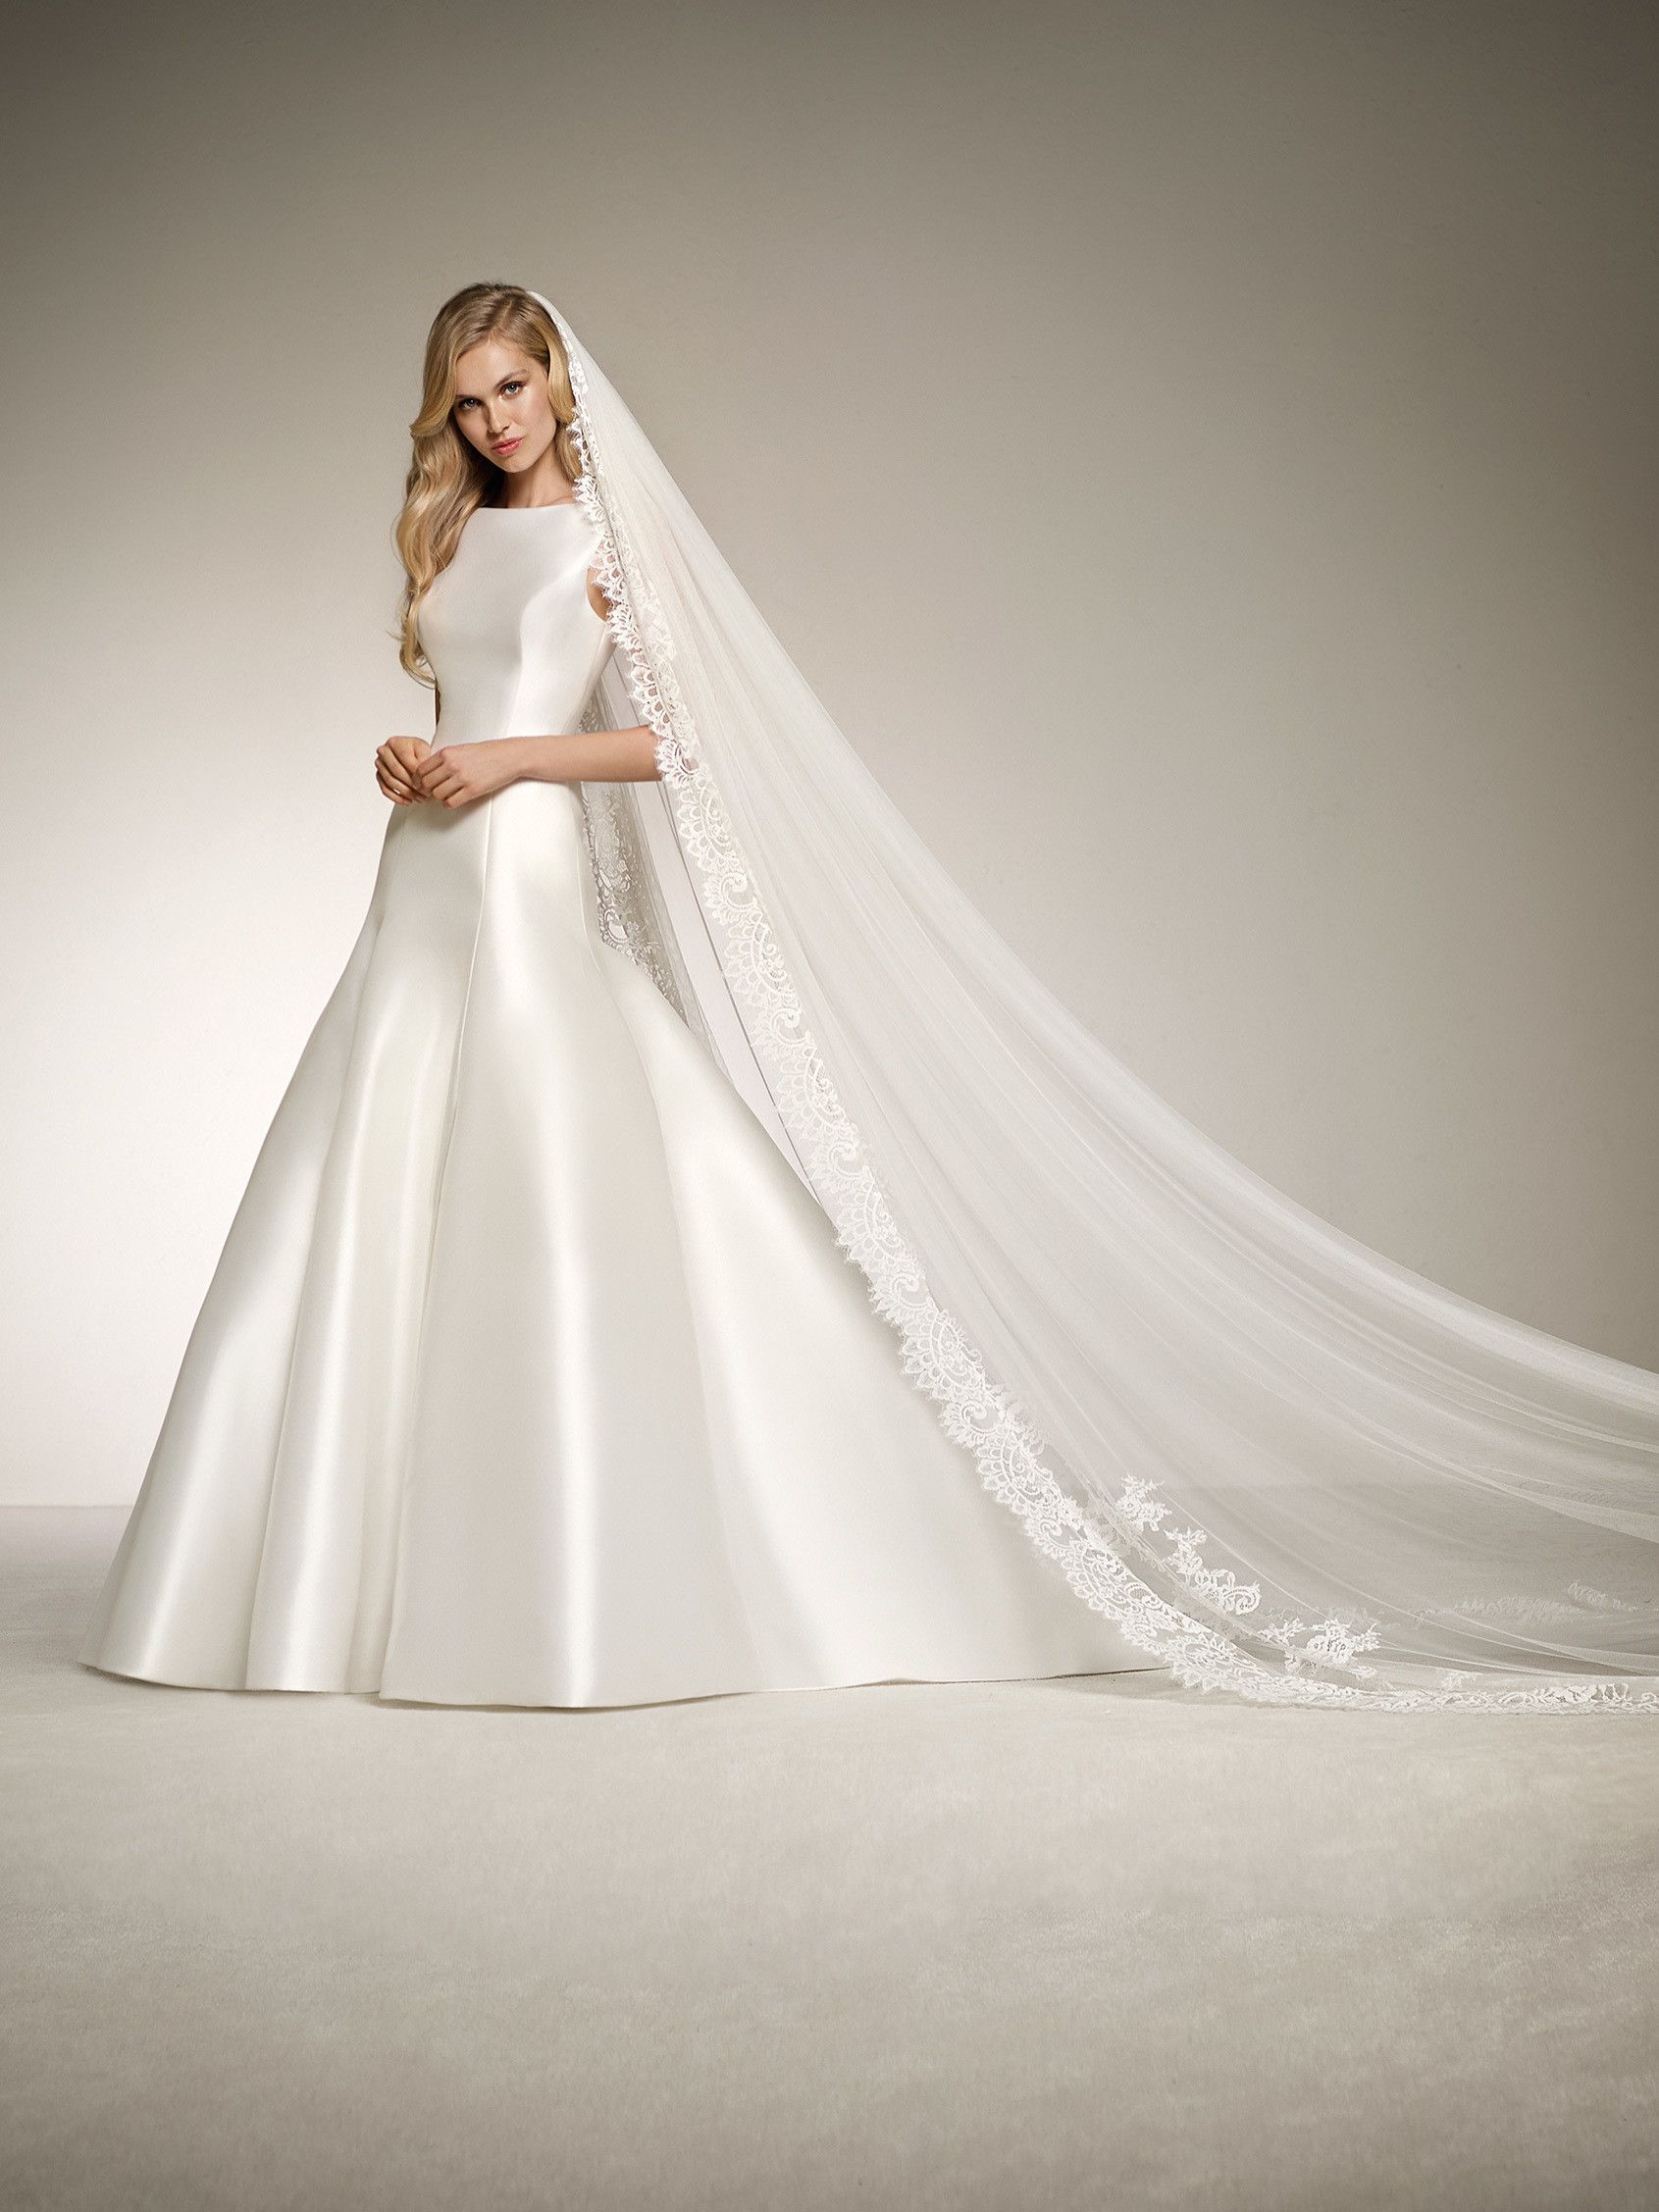 24++ Rosa clara wedding dresses ireland ideas in 2021